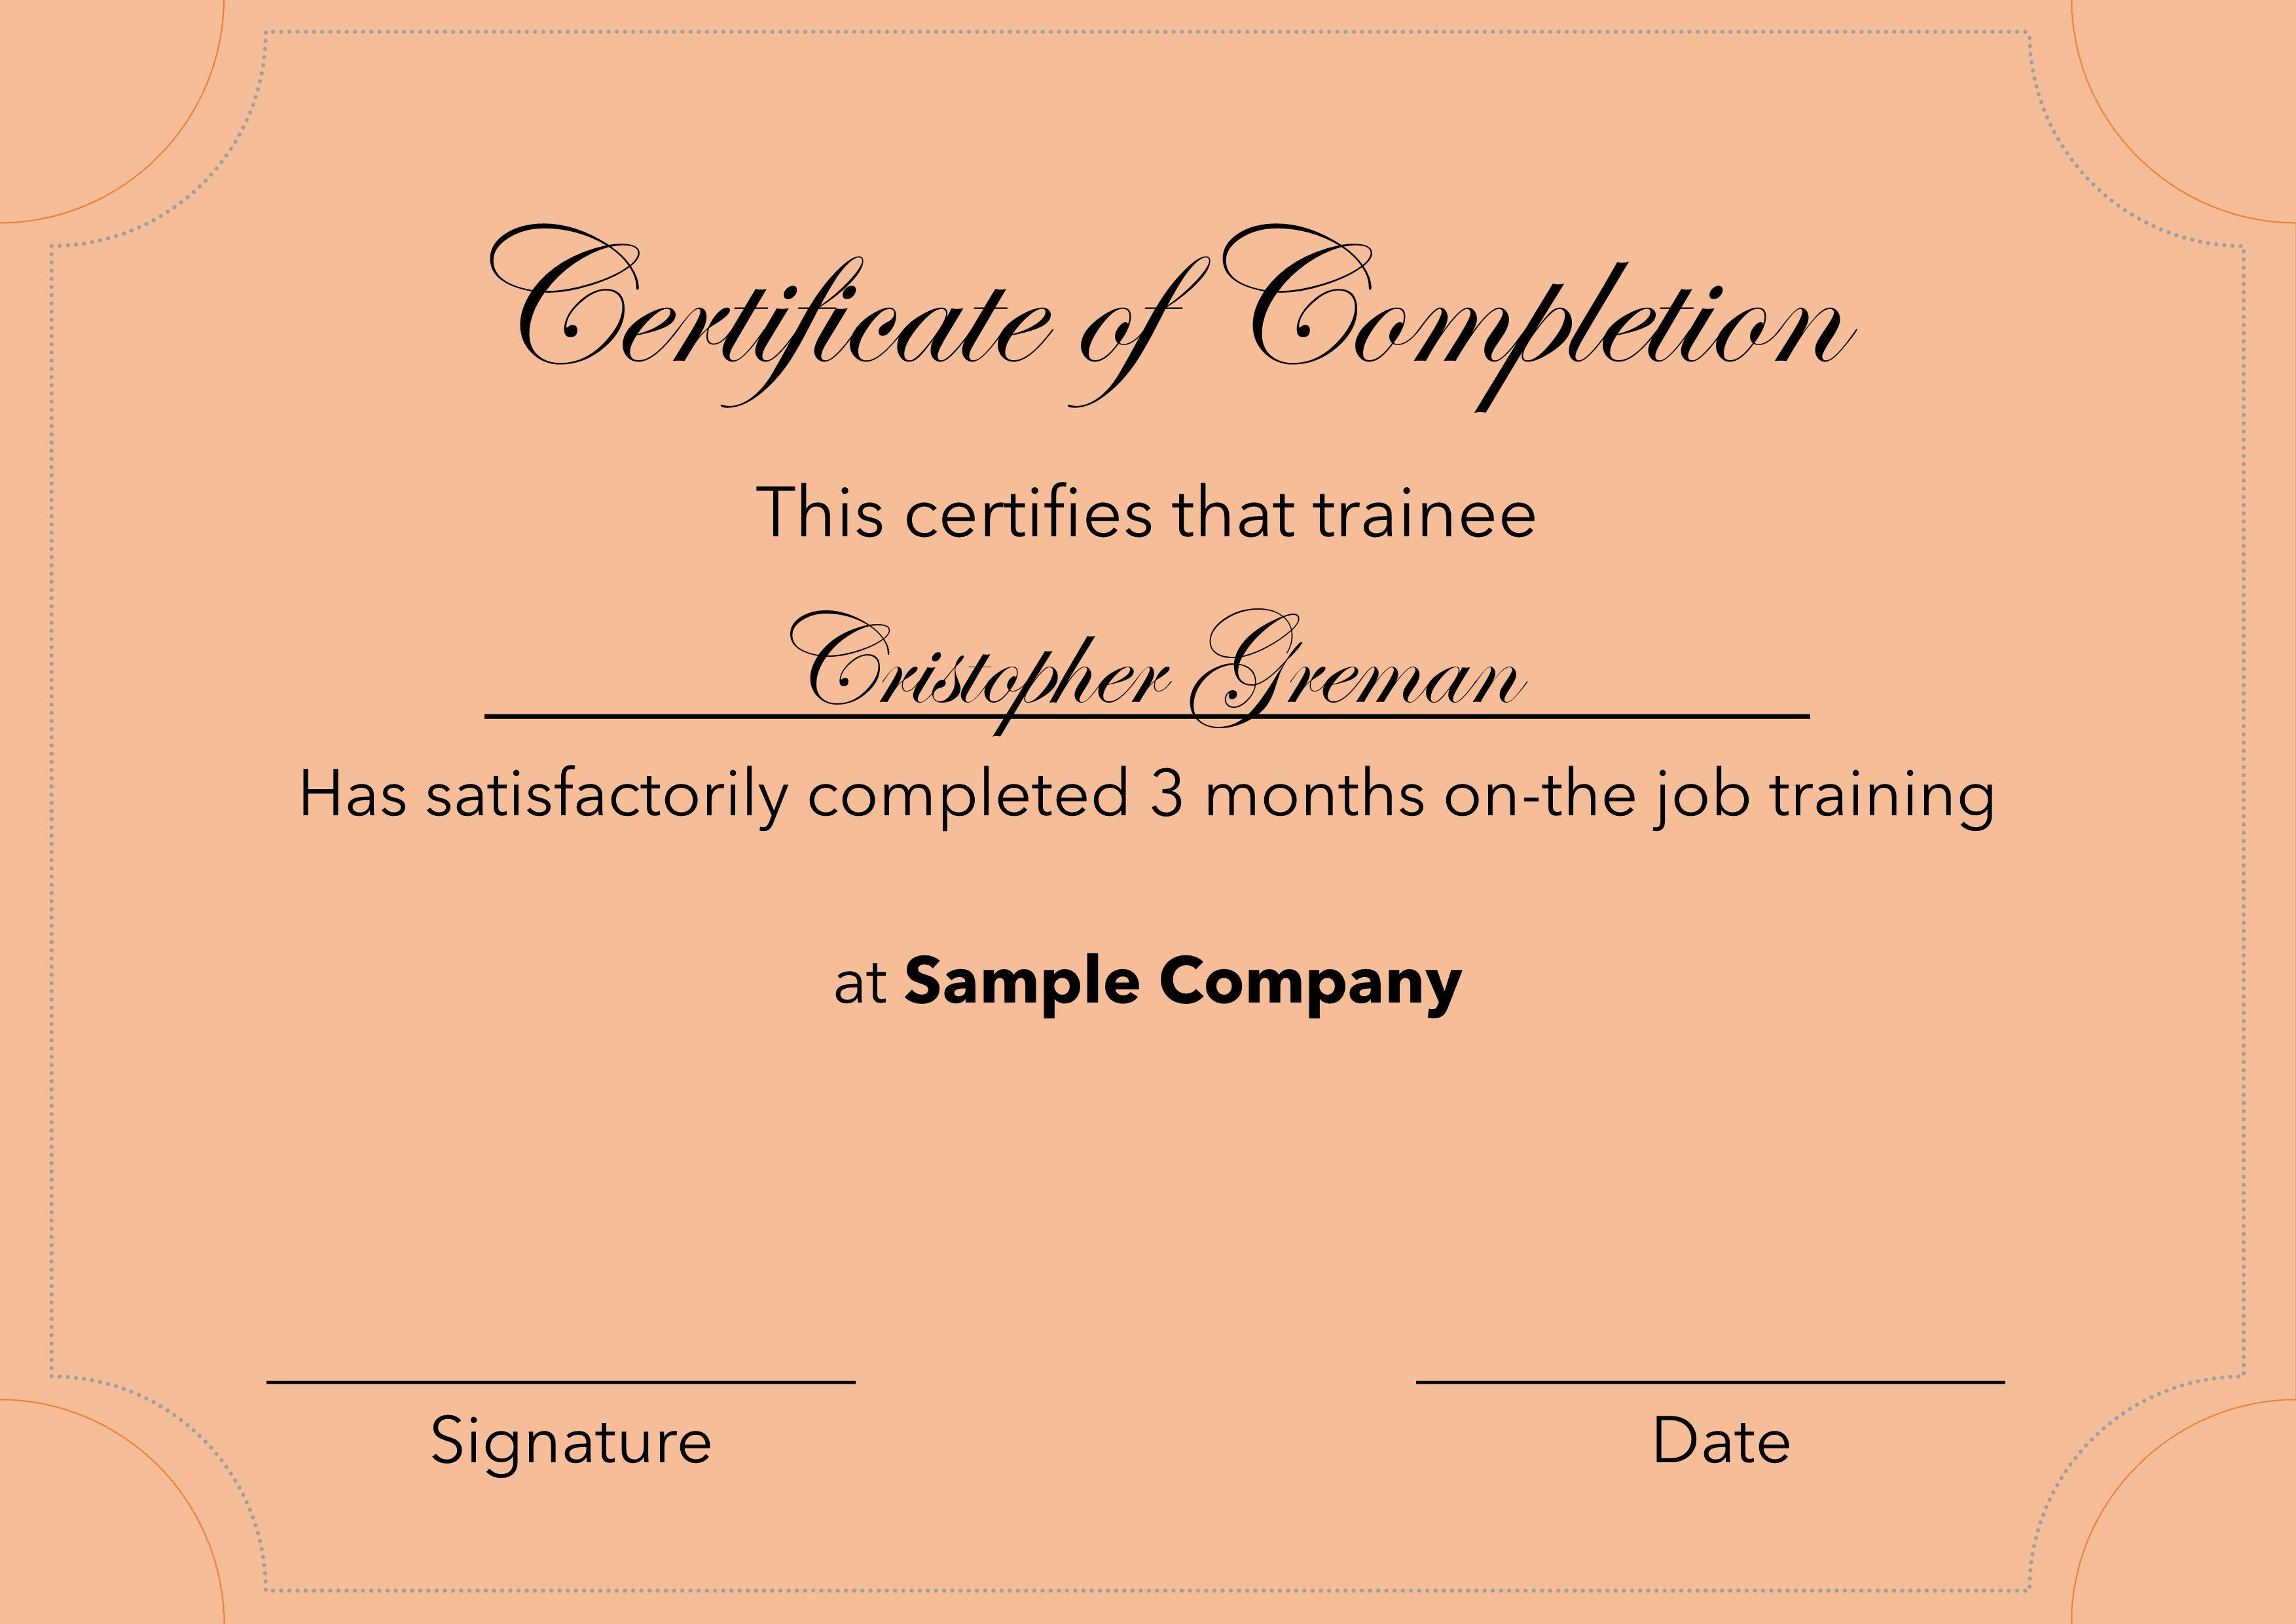 Final Certificate result